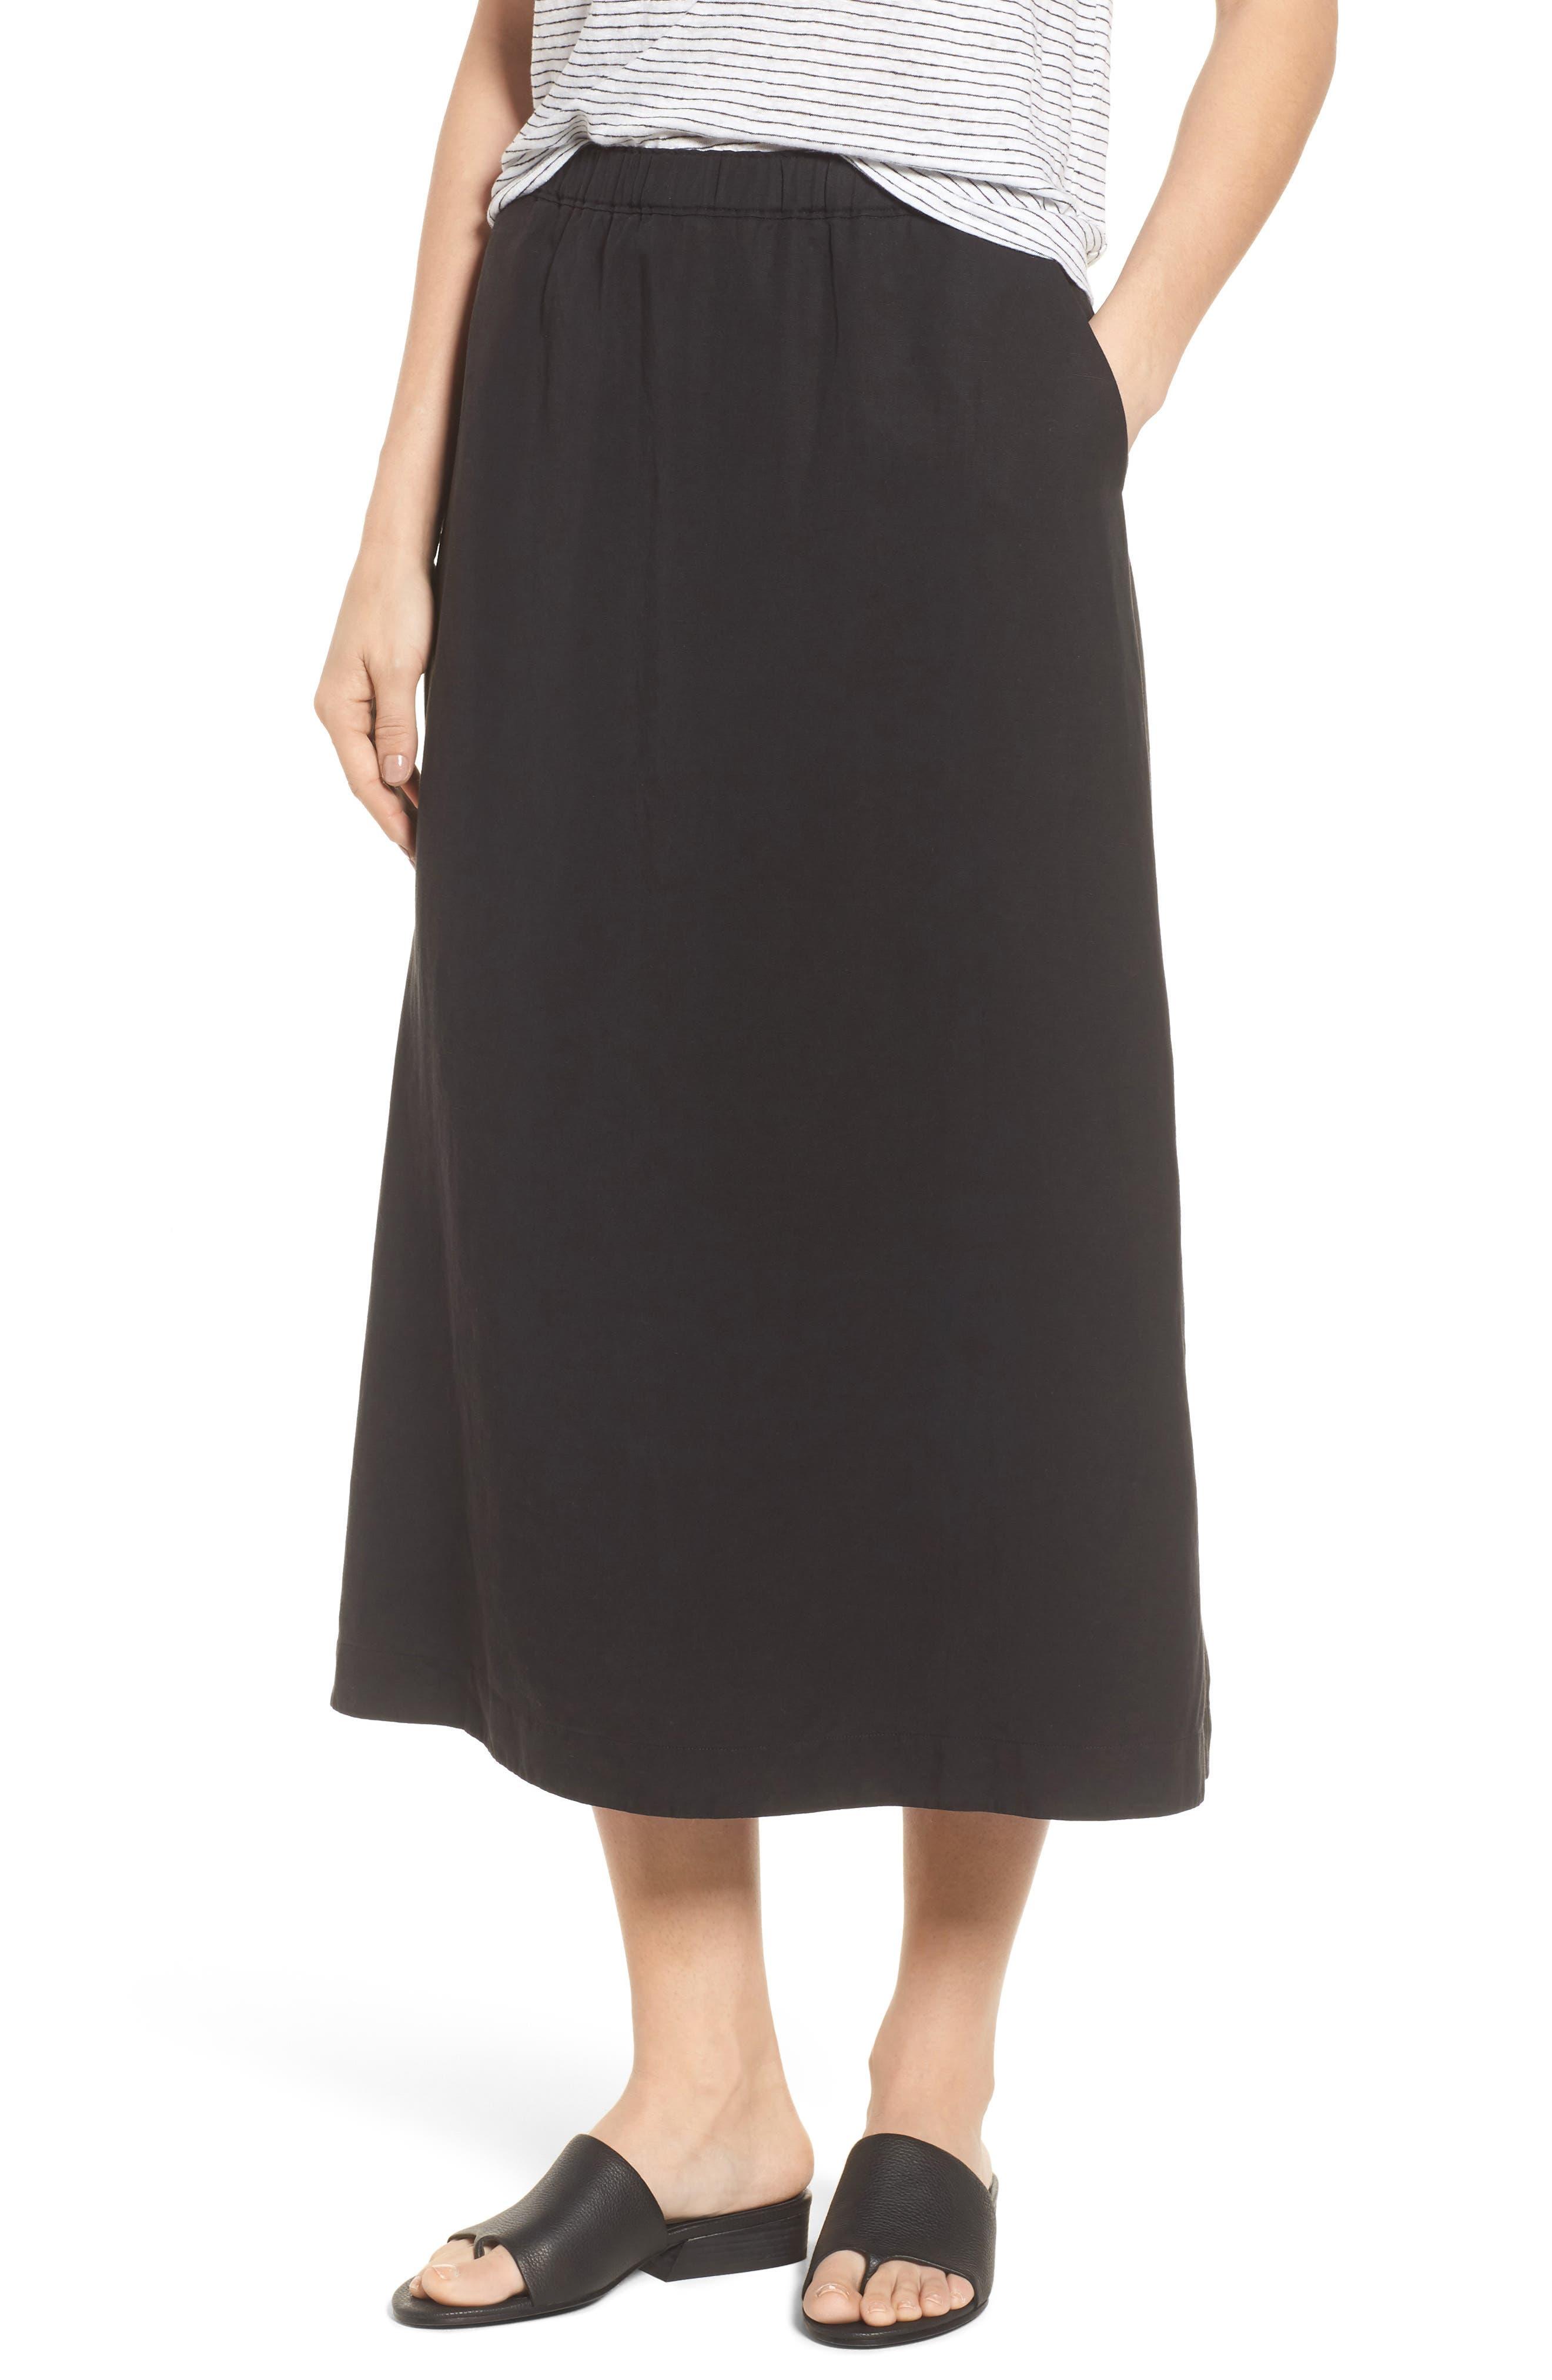 Tencel<sup>®</sup> Lyocell & Linen Midi Skirt,                             Main thumbnail 1, color,                             001